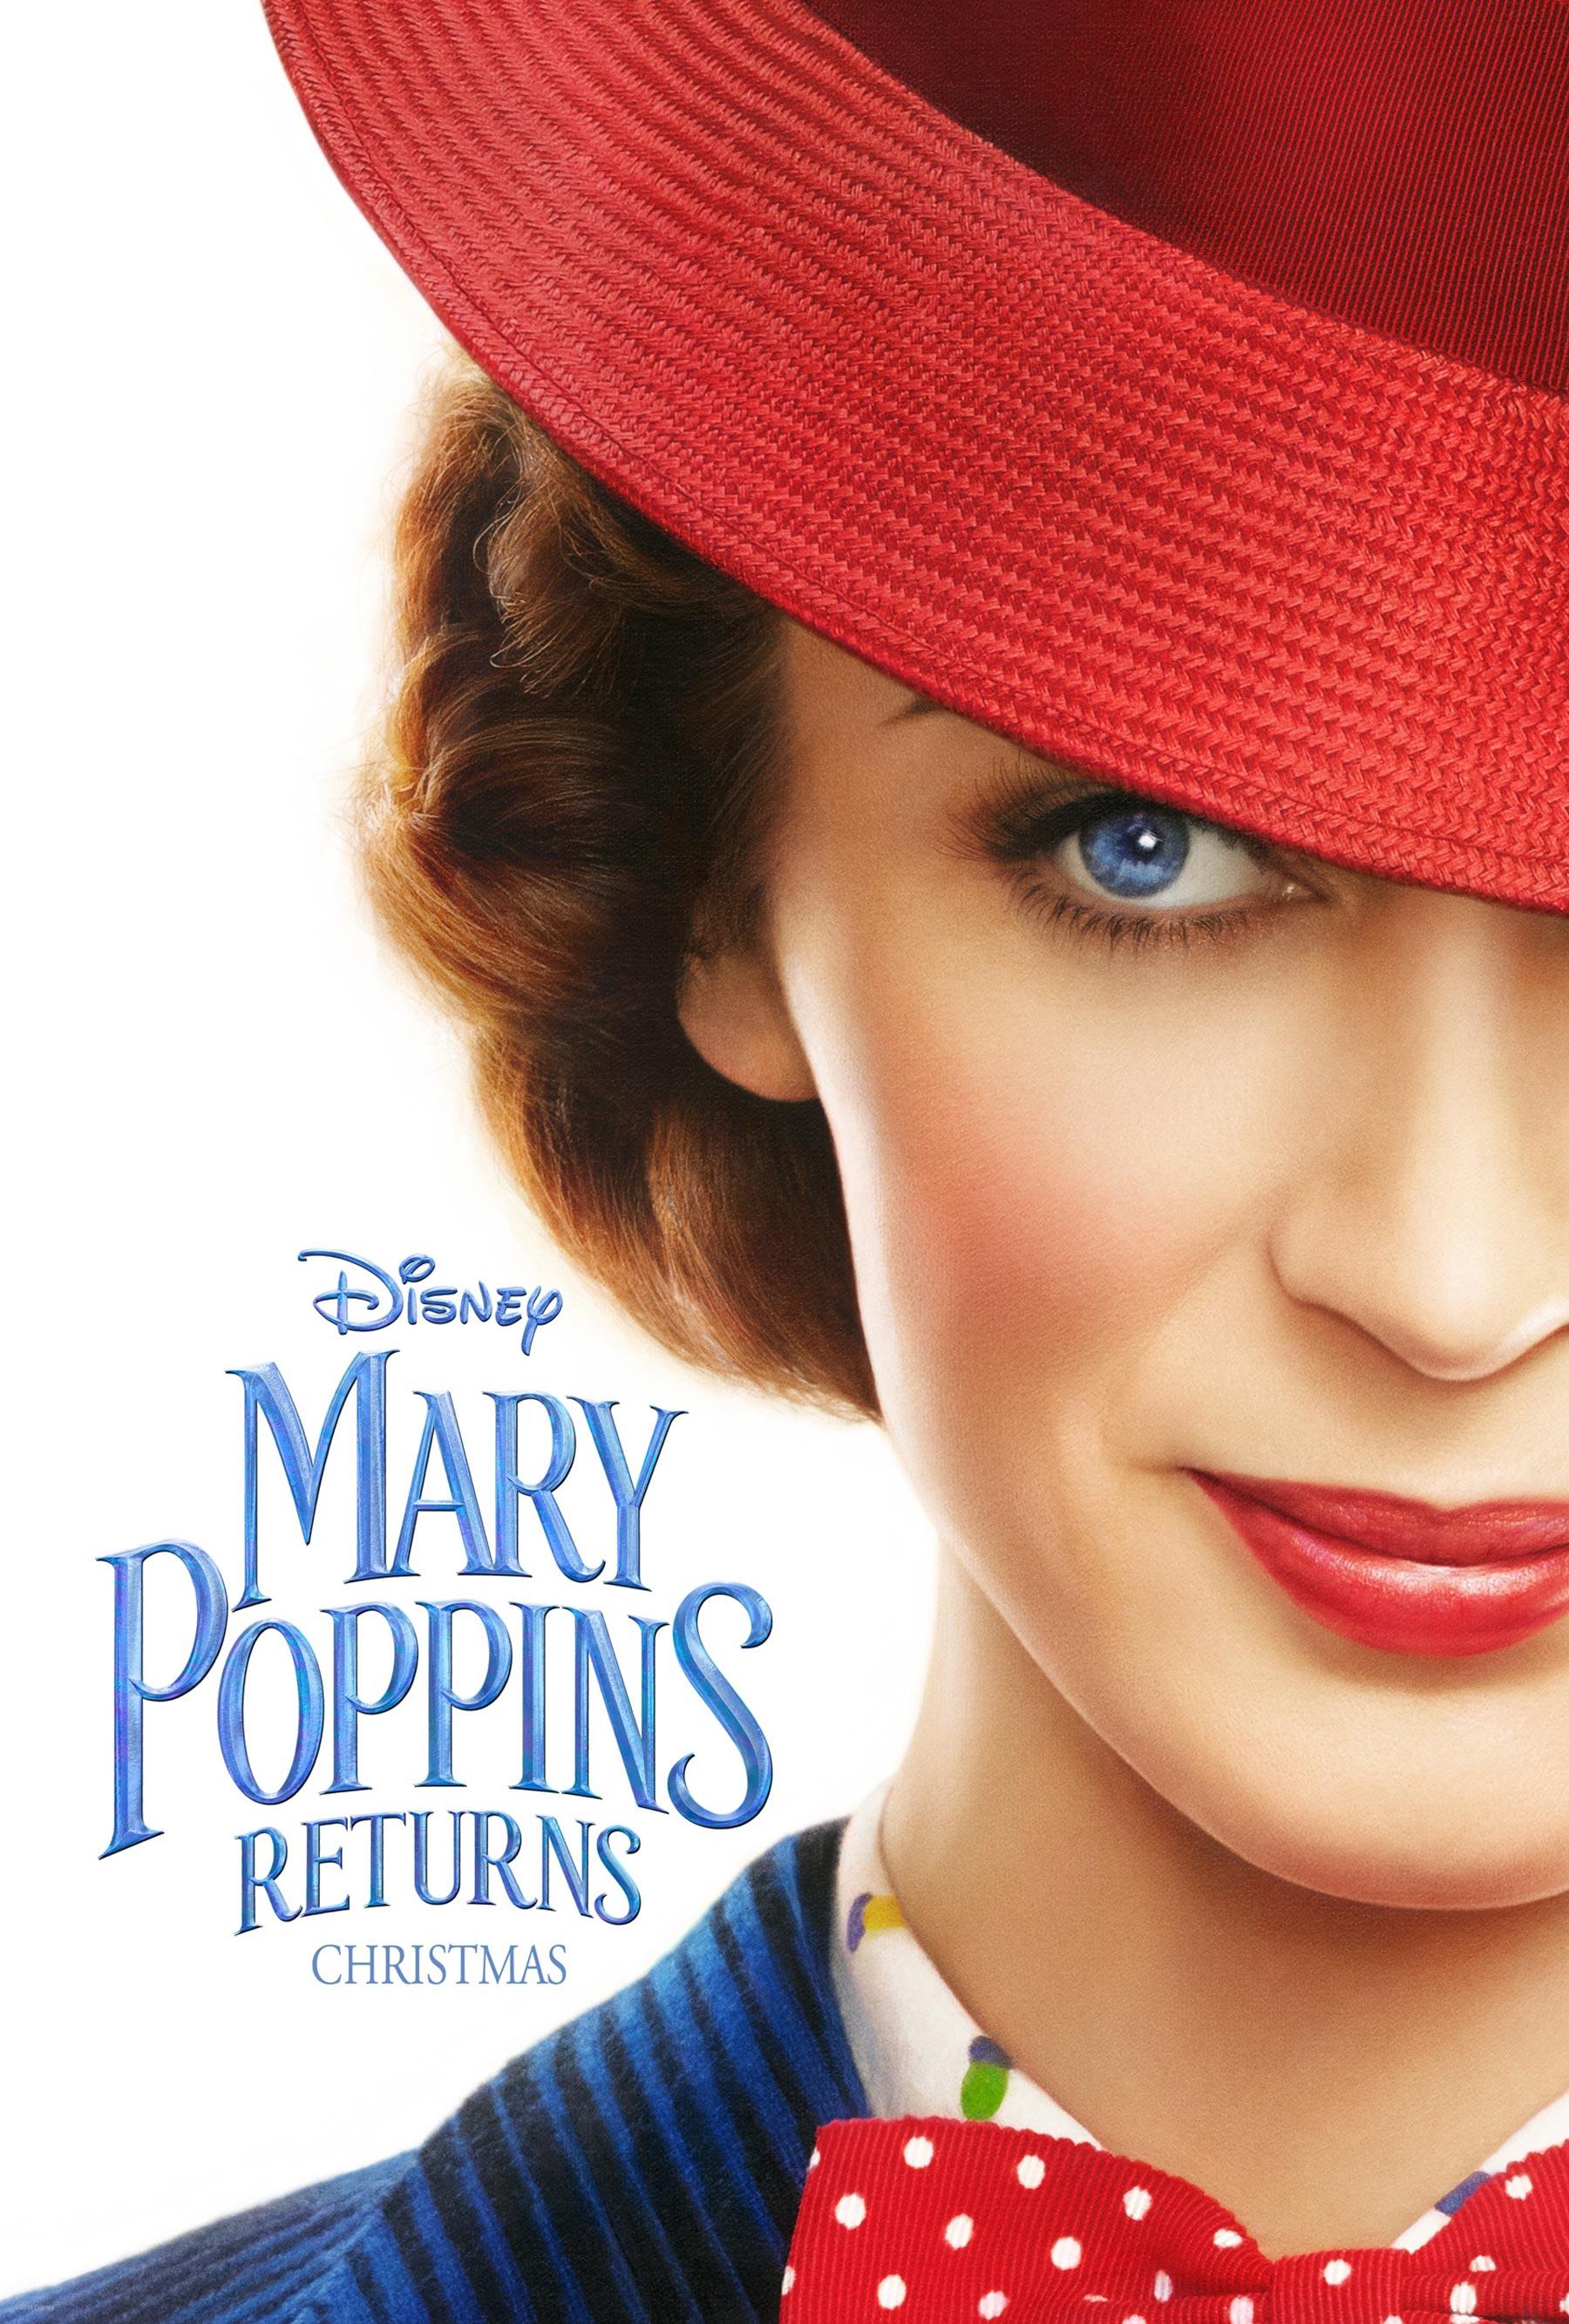 Oficiálny teaser plagát na film Mary Poppins Returns